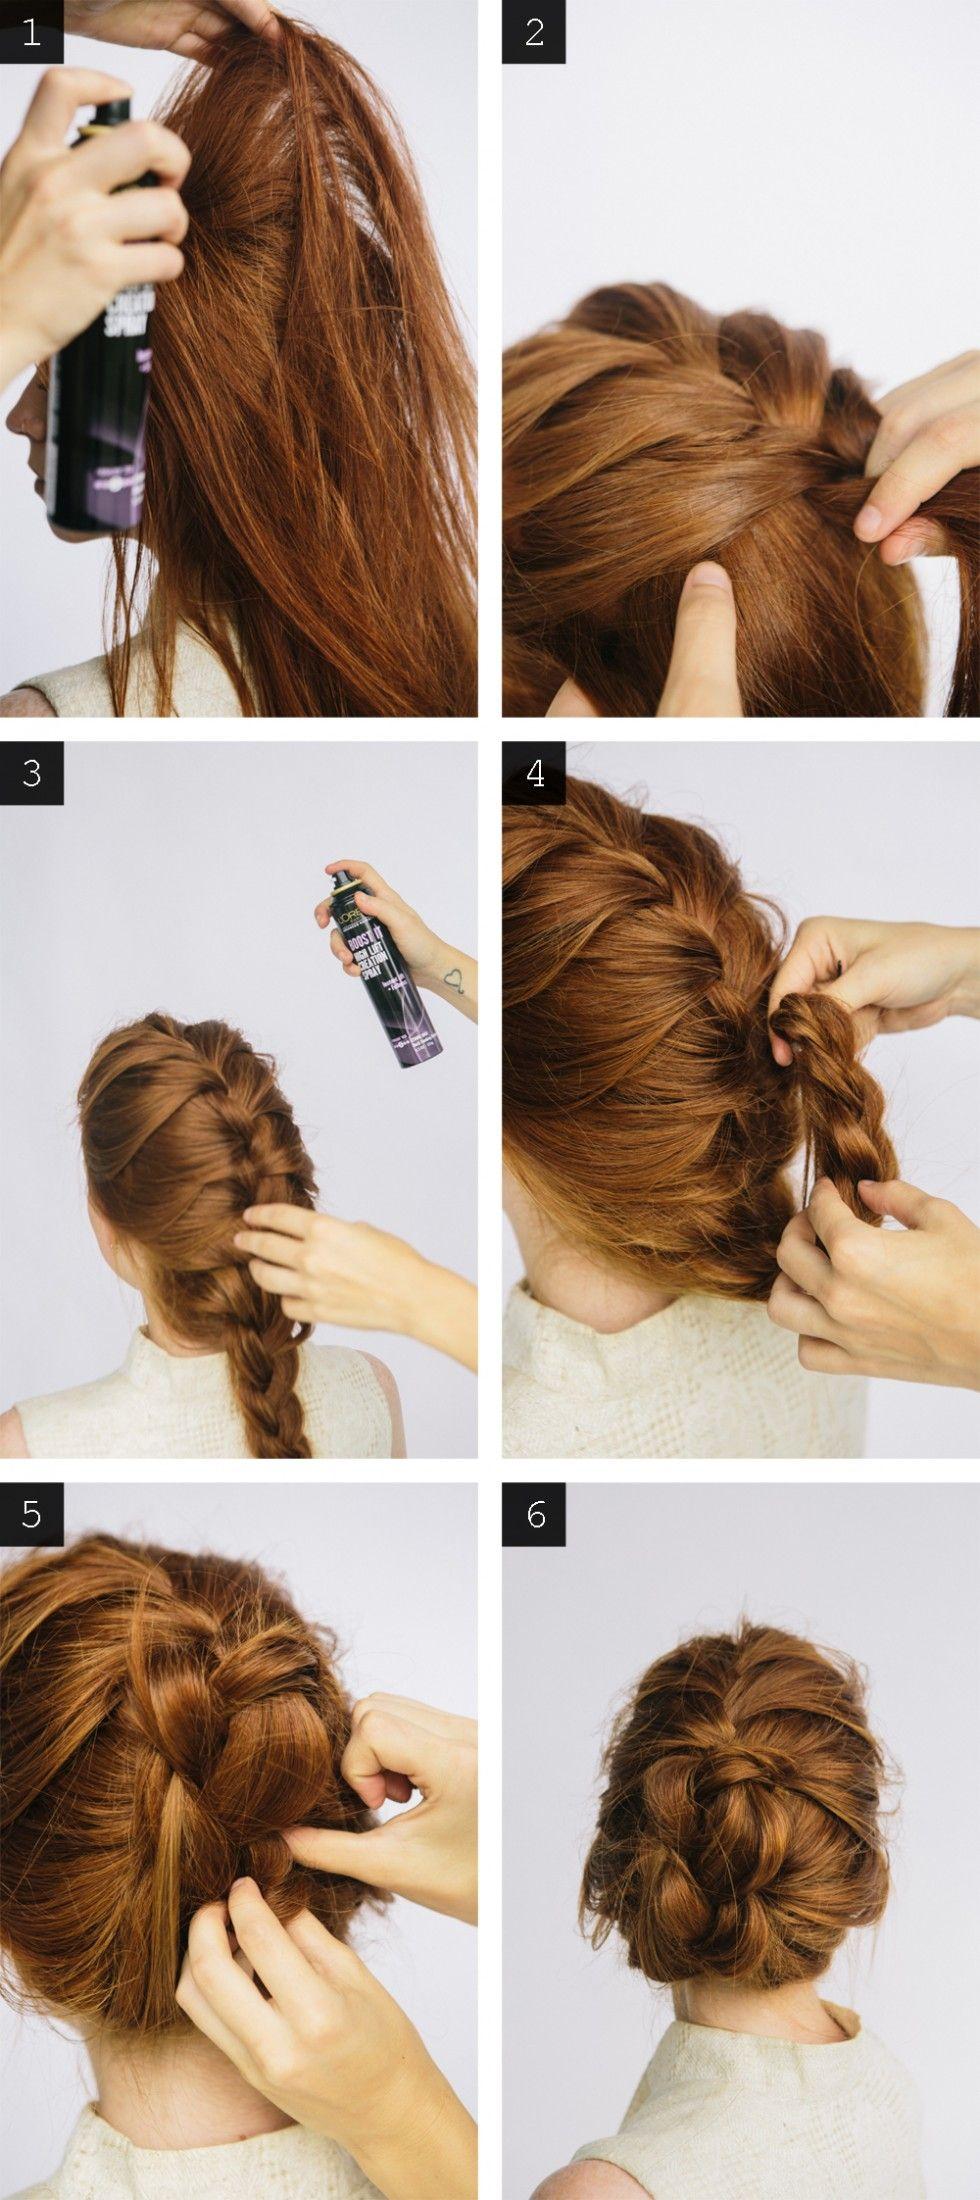 Diy braided bun updo hairstyle hair and beauty pinterest bun